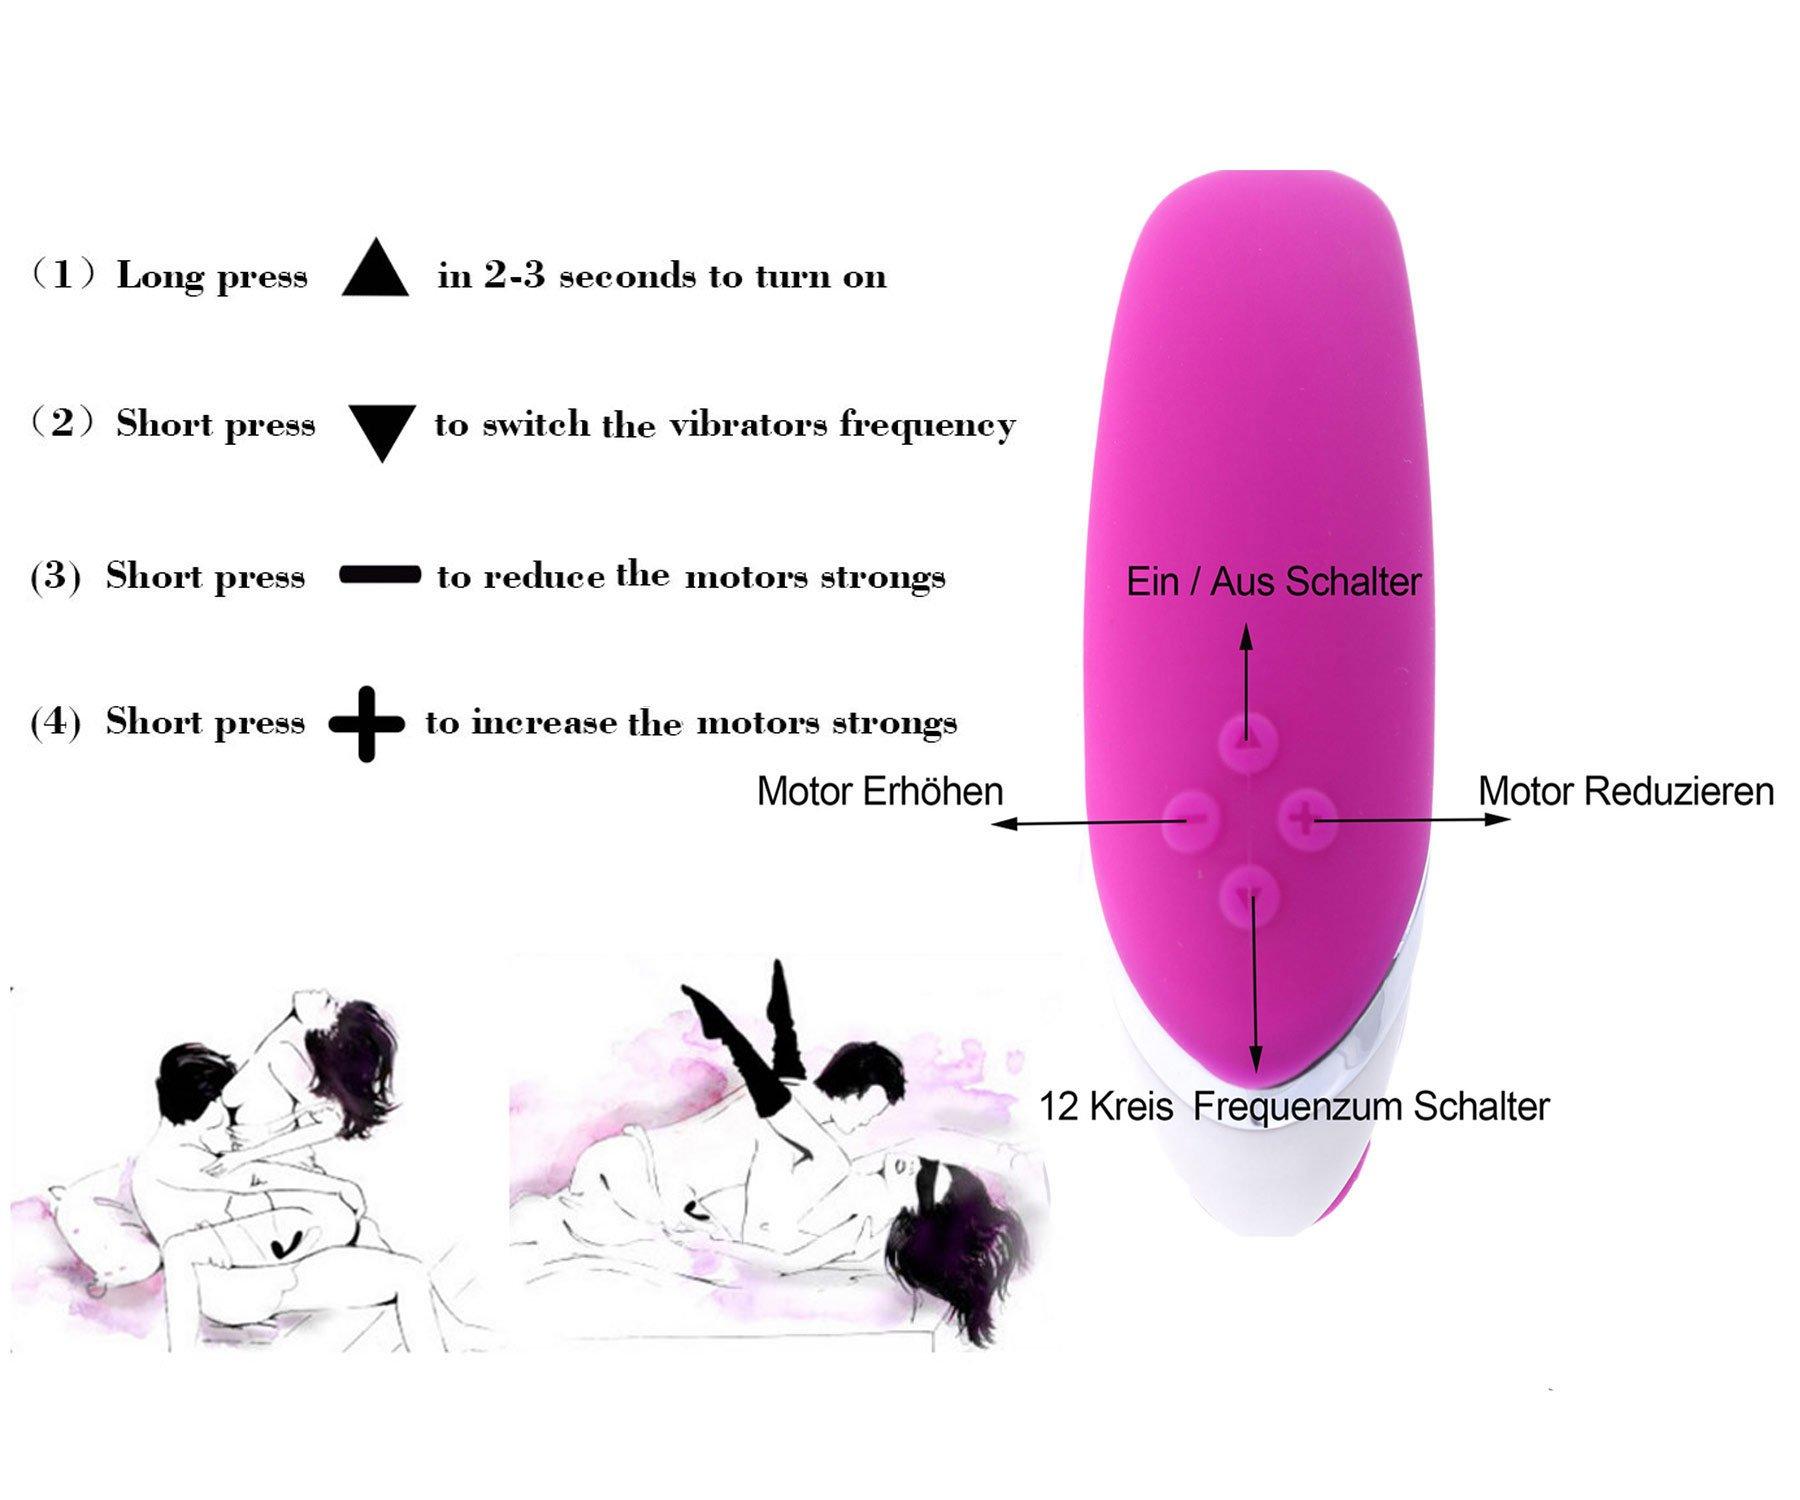 Himall Silikon G Punkt Paar Vibrator für Klitoris Stimulation Massage Orgasm,Wiederaufladbar